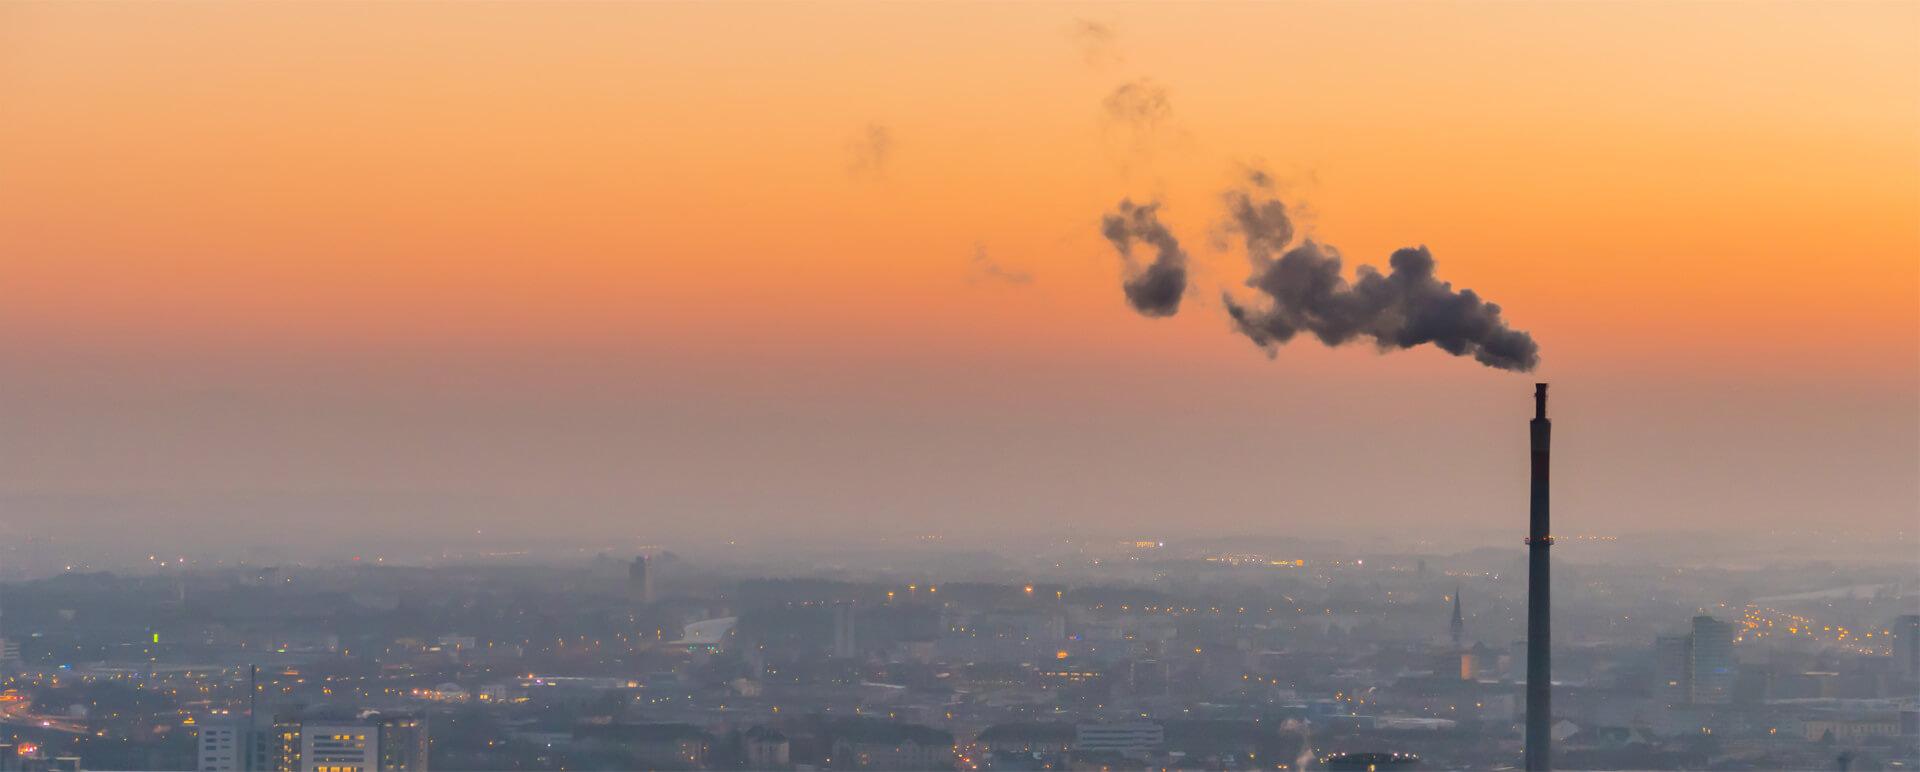 environmental-air-stack-emissions-hazardous-pollutants-greenhouse-gases.jpg